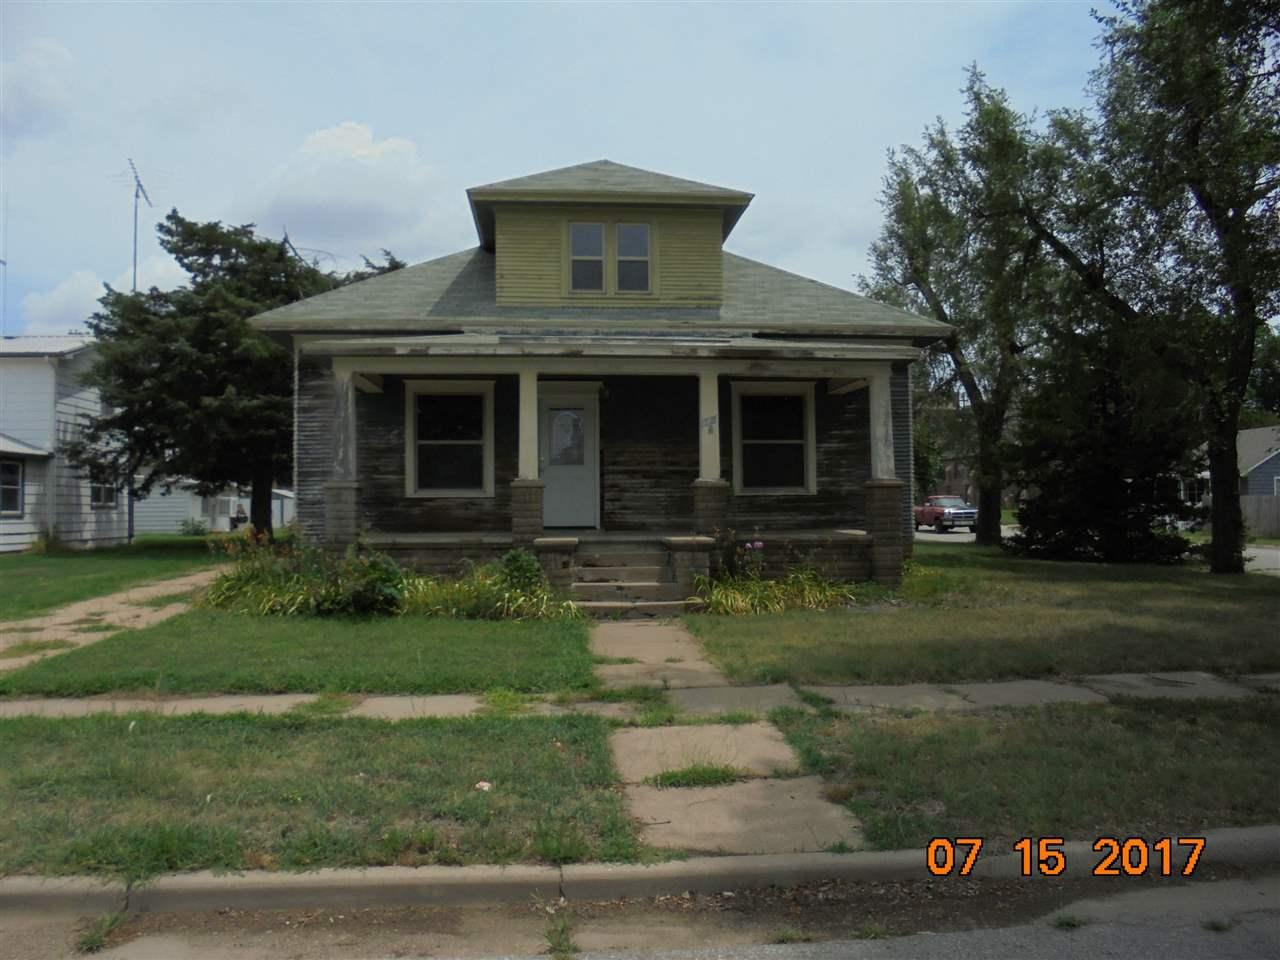 126 S Collingwood, Pretty Prairie, KS 67570